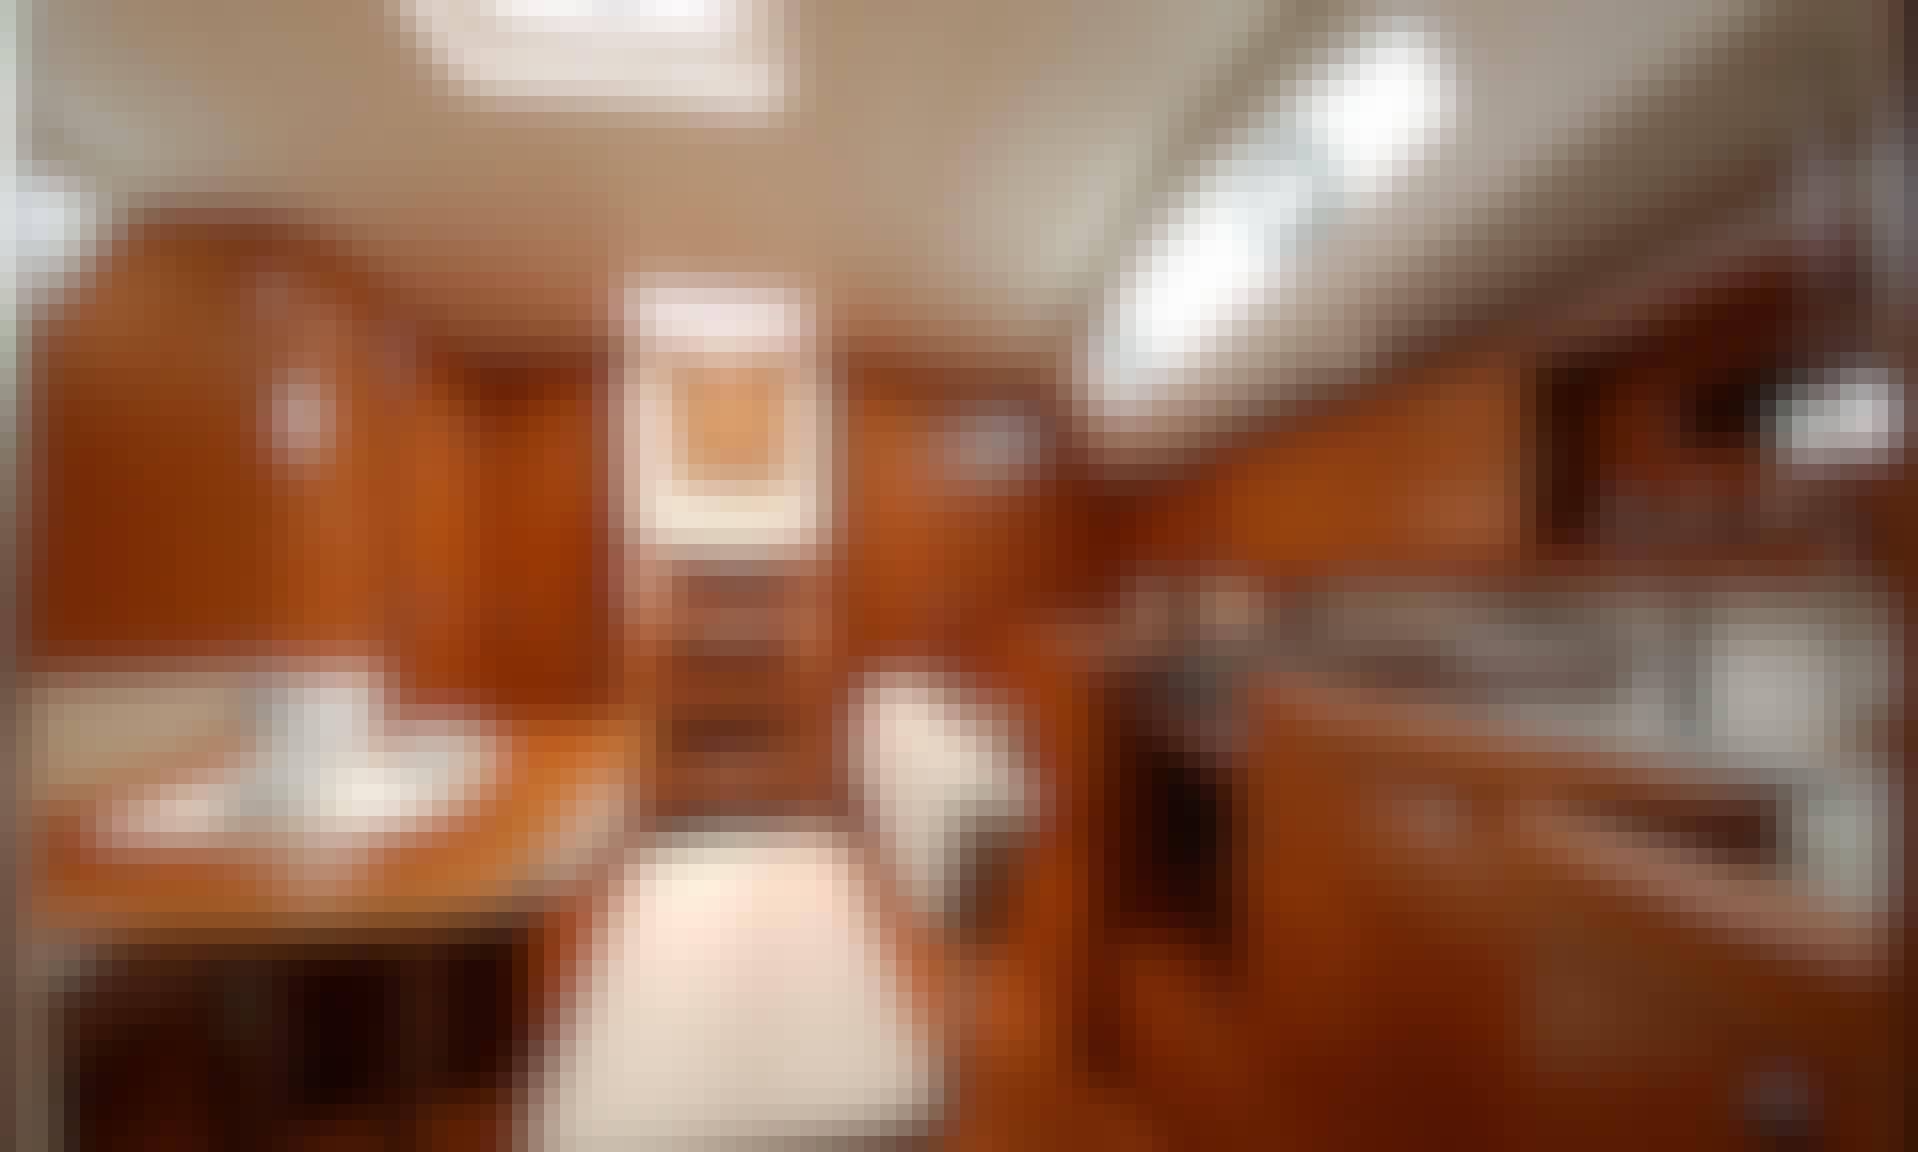 The Pleasure of Sailing with Comfort - Beneteau Oceanis 43 Sailboat